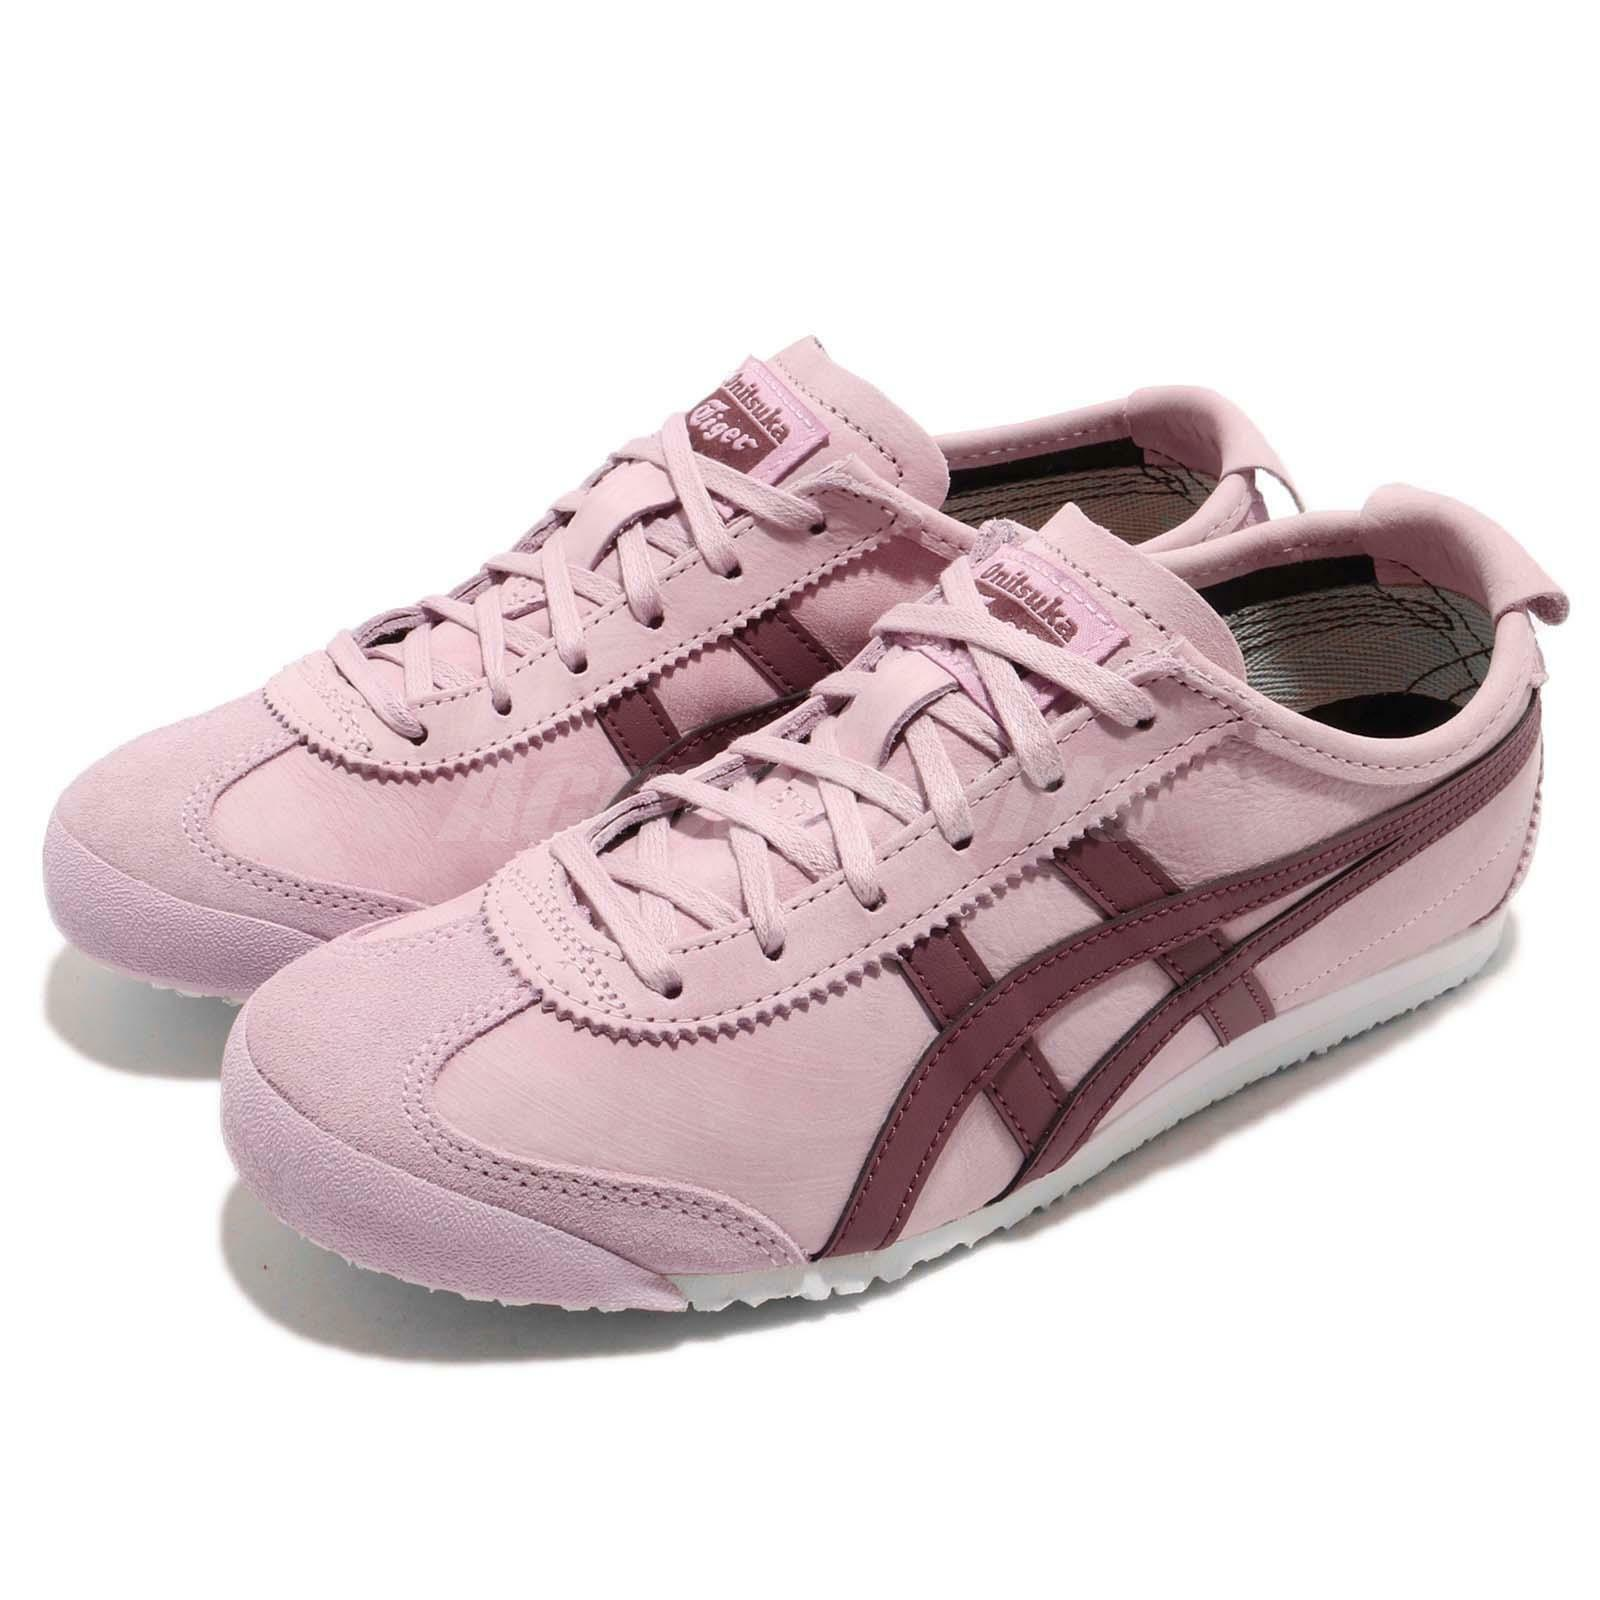 Asics Onitsuka Tiger Mexico 66 Pink  Purple Men Running shoes Sneaker 1183A19-8700  popular